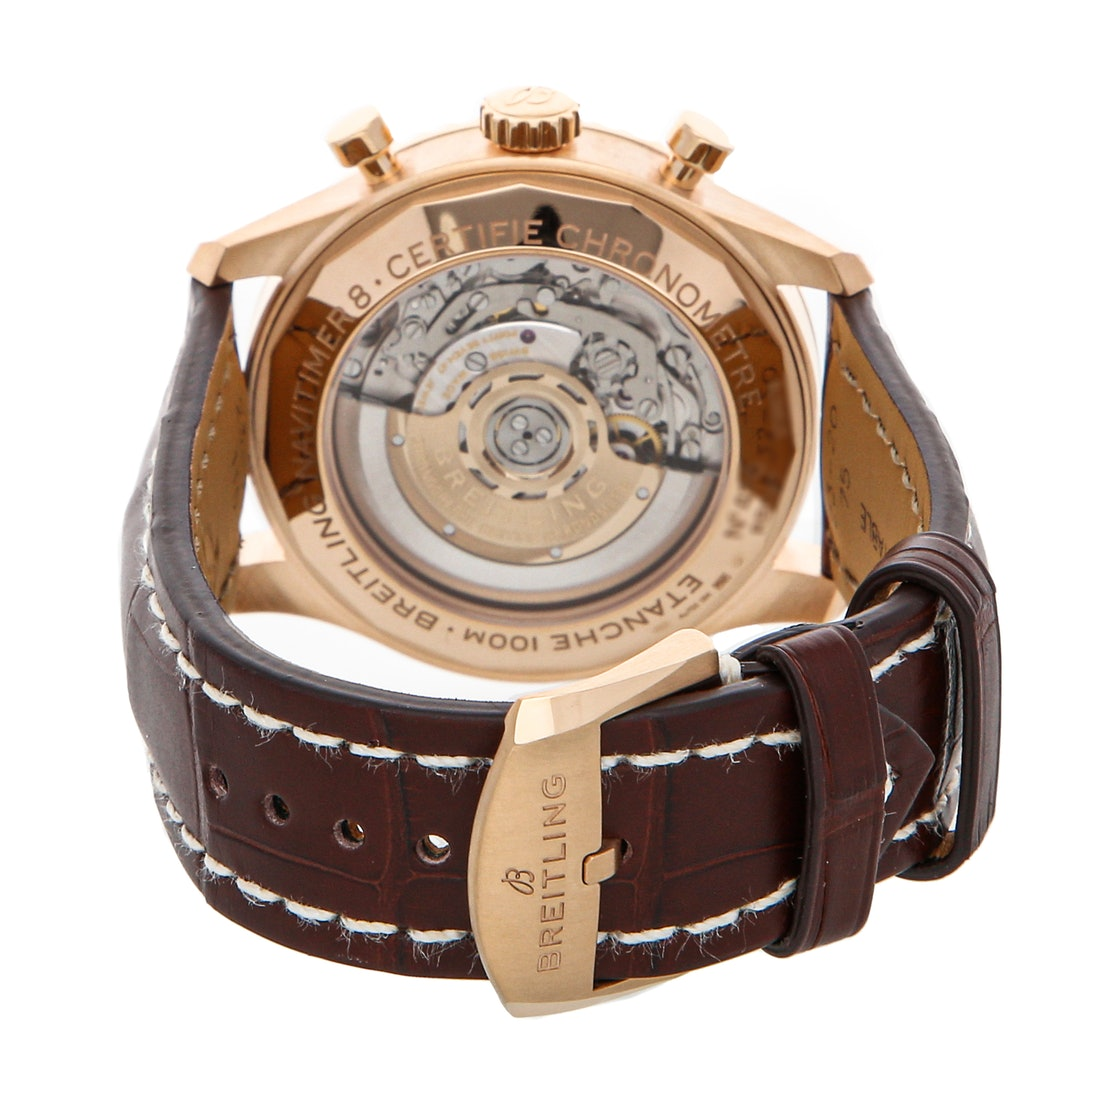 Breitling Navitimer 8 B01 Chronograph RB0117131/Q1P1